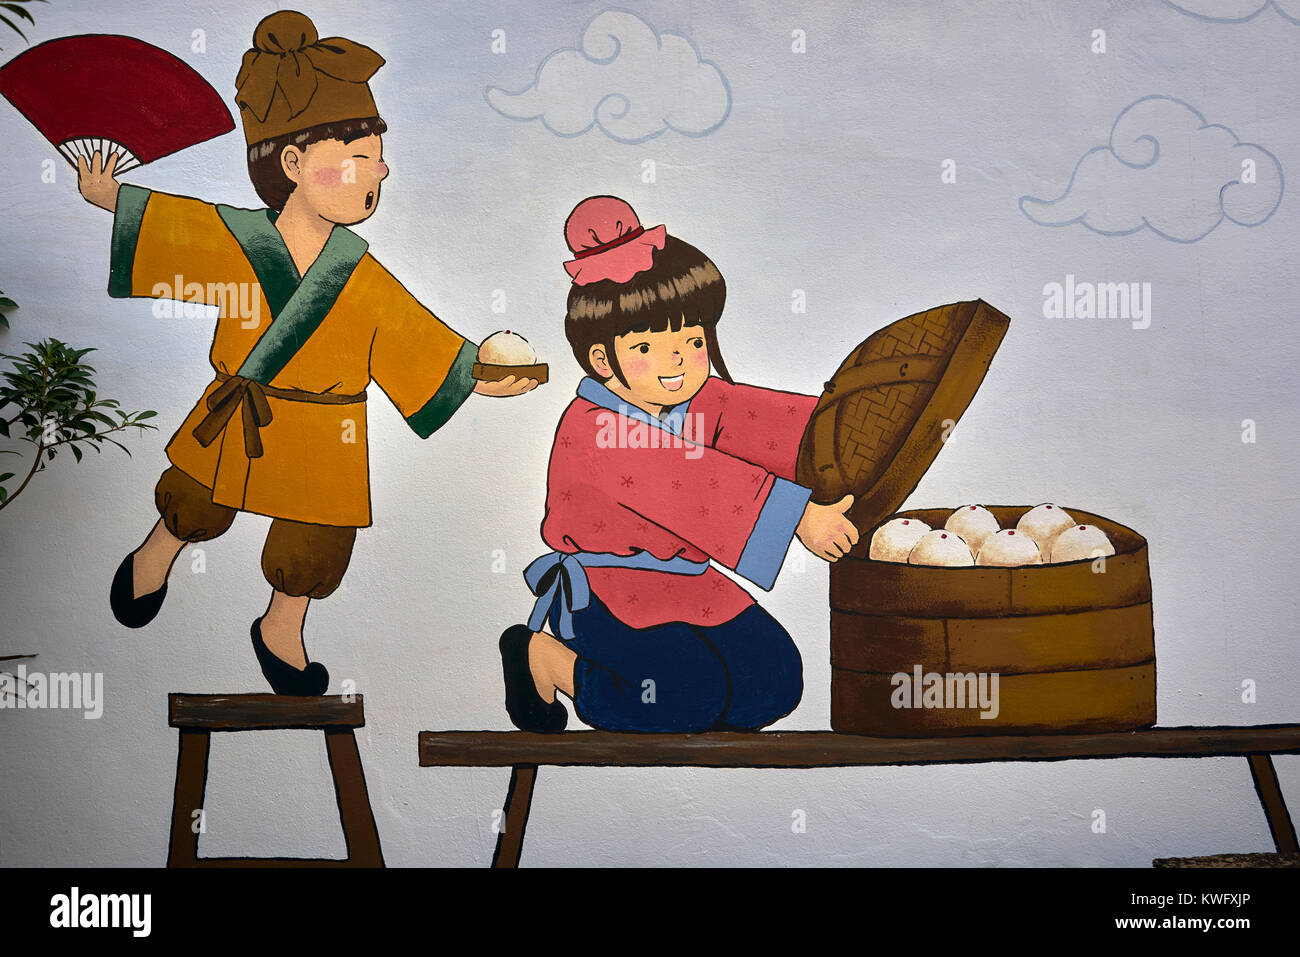 Wall art, Chinese illustration. - Stock Image